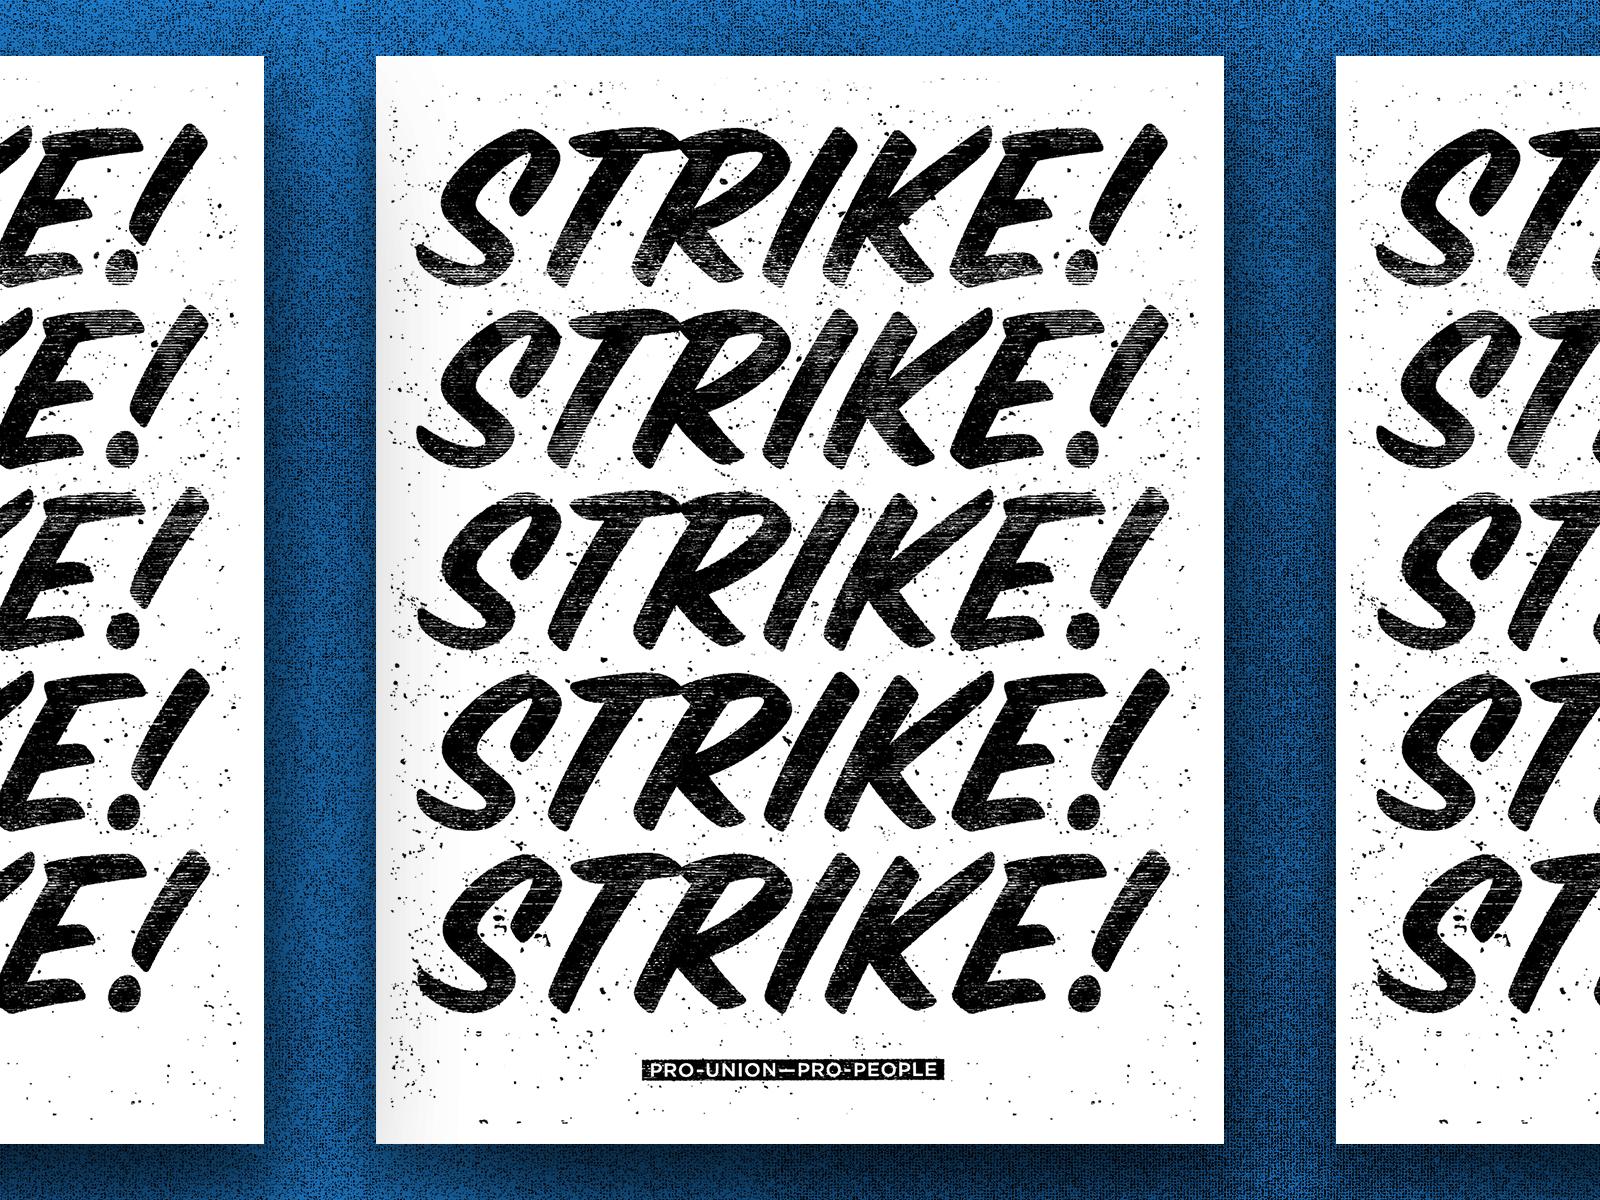 Jkdc pttp strike